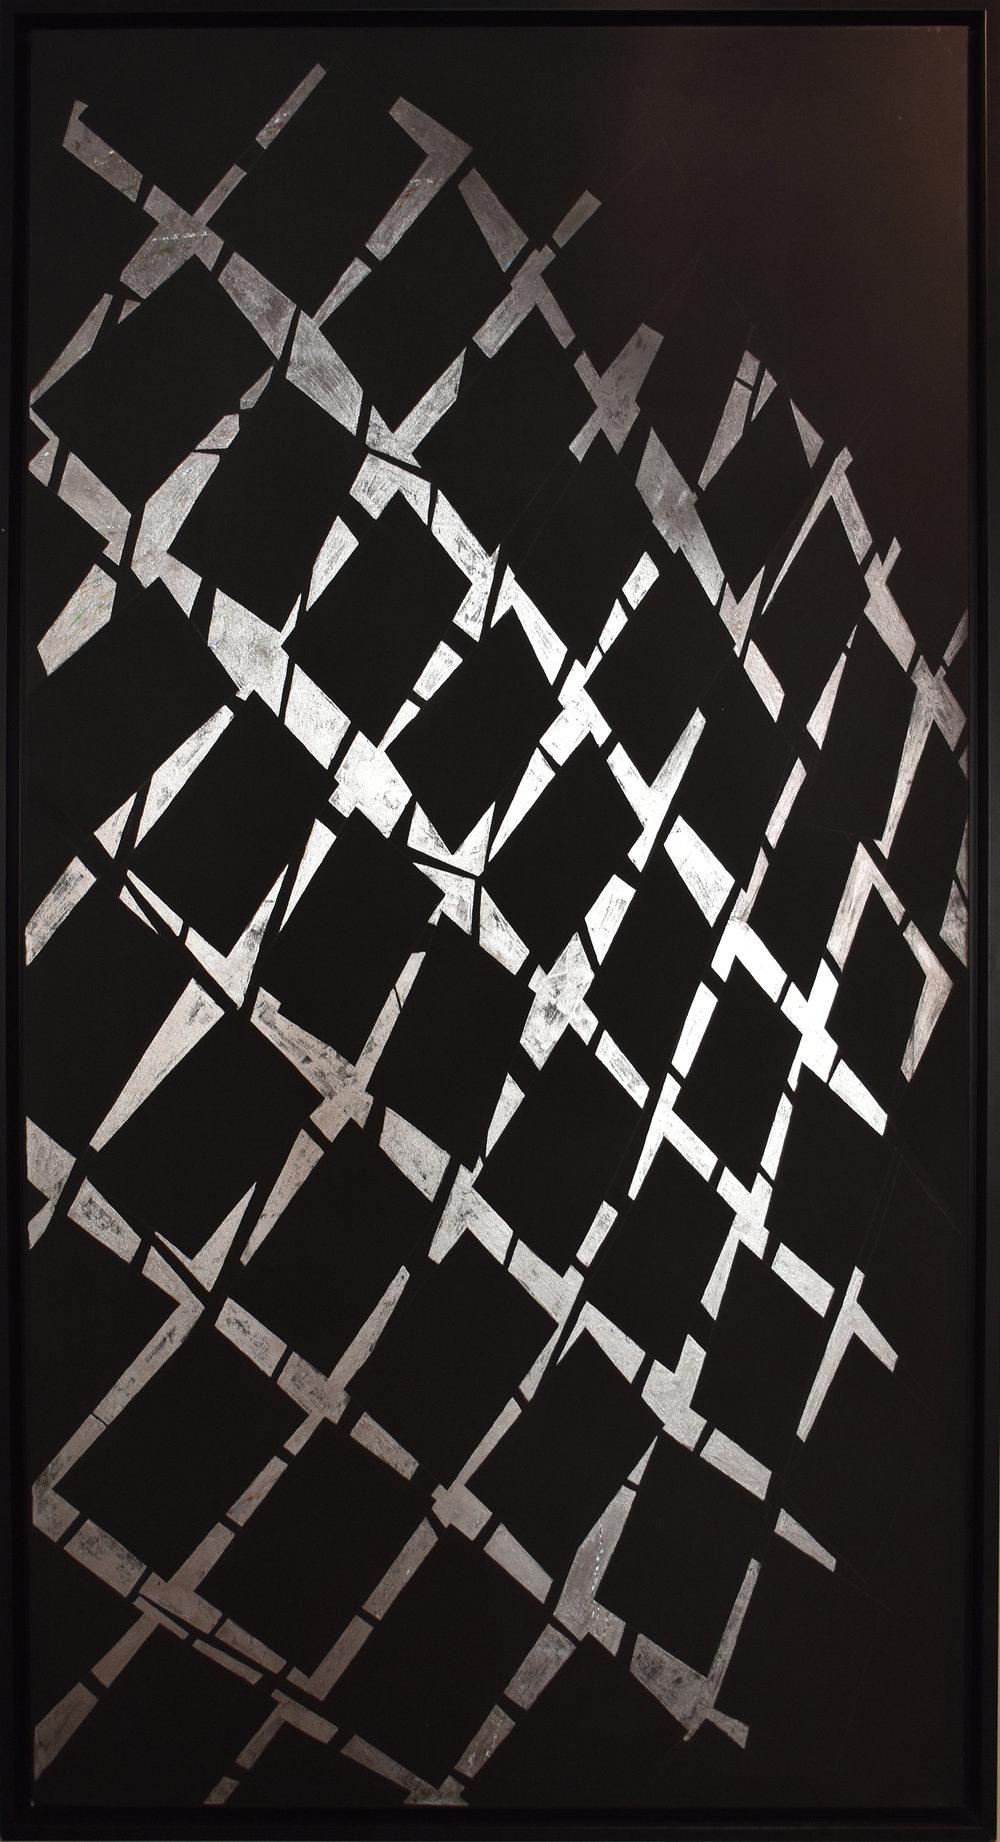 Primigenia 3 - 2011Mixed media on canvas200 x 100 cm